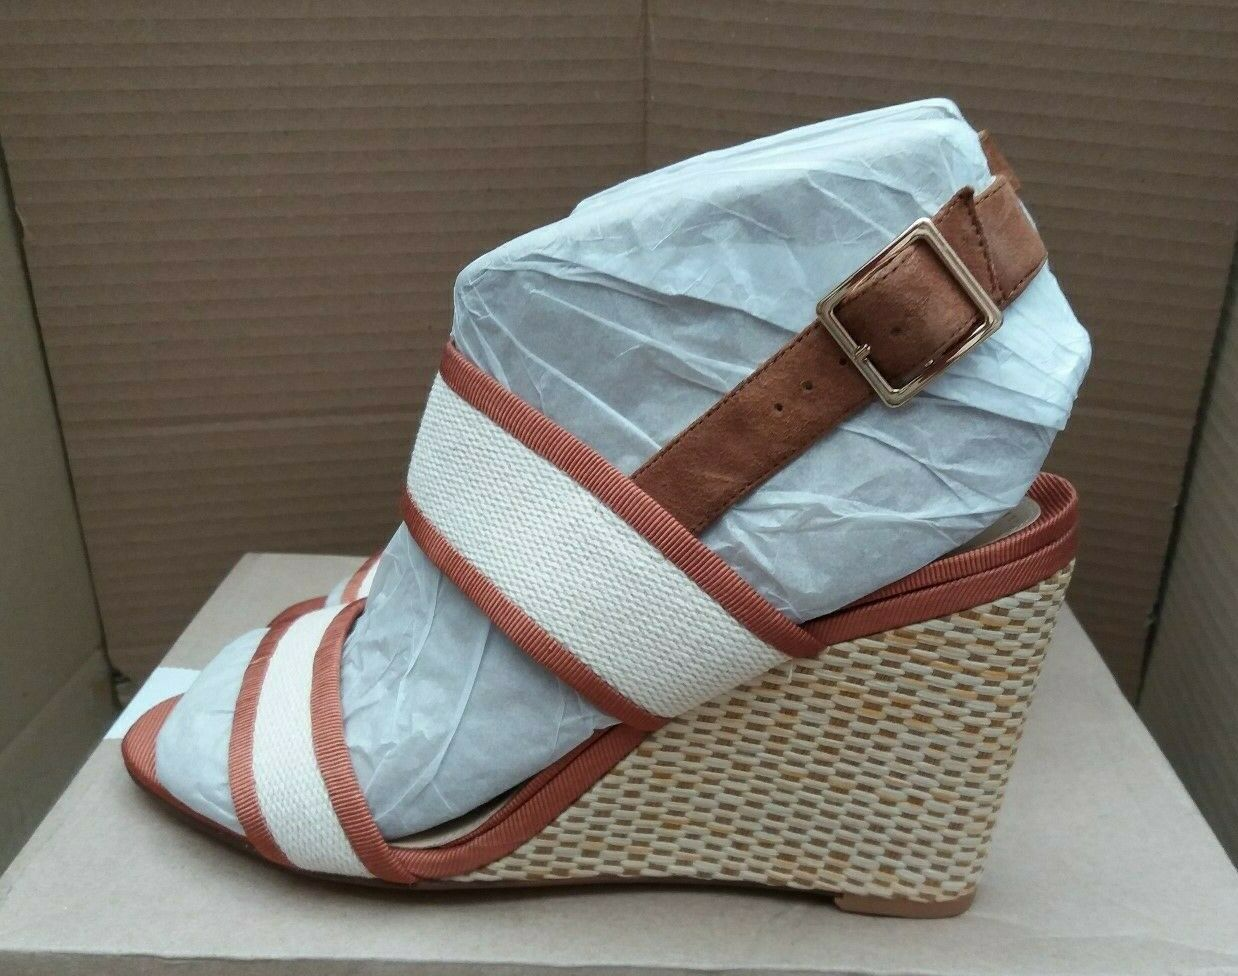 Clarks  Image Weave  Summer Wedge Sandals - Tan - UK 7 EU 41